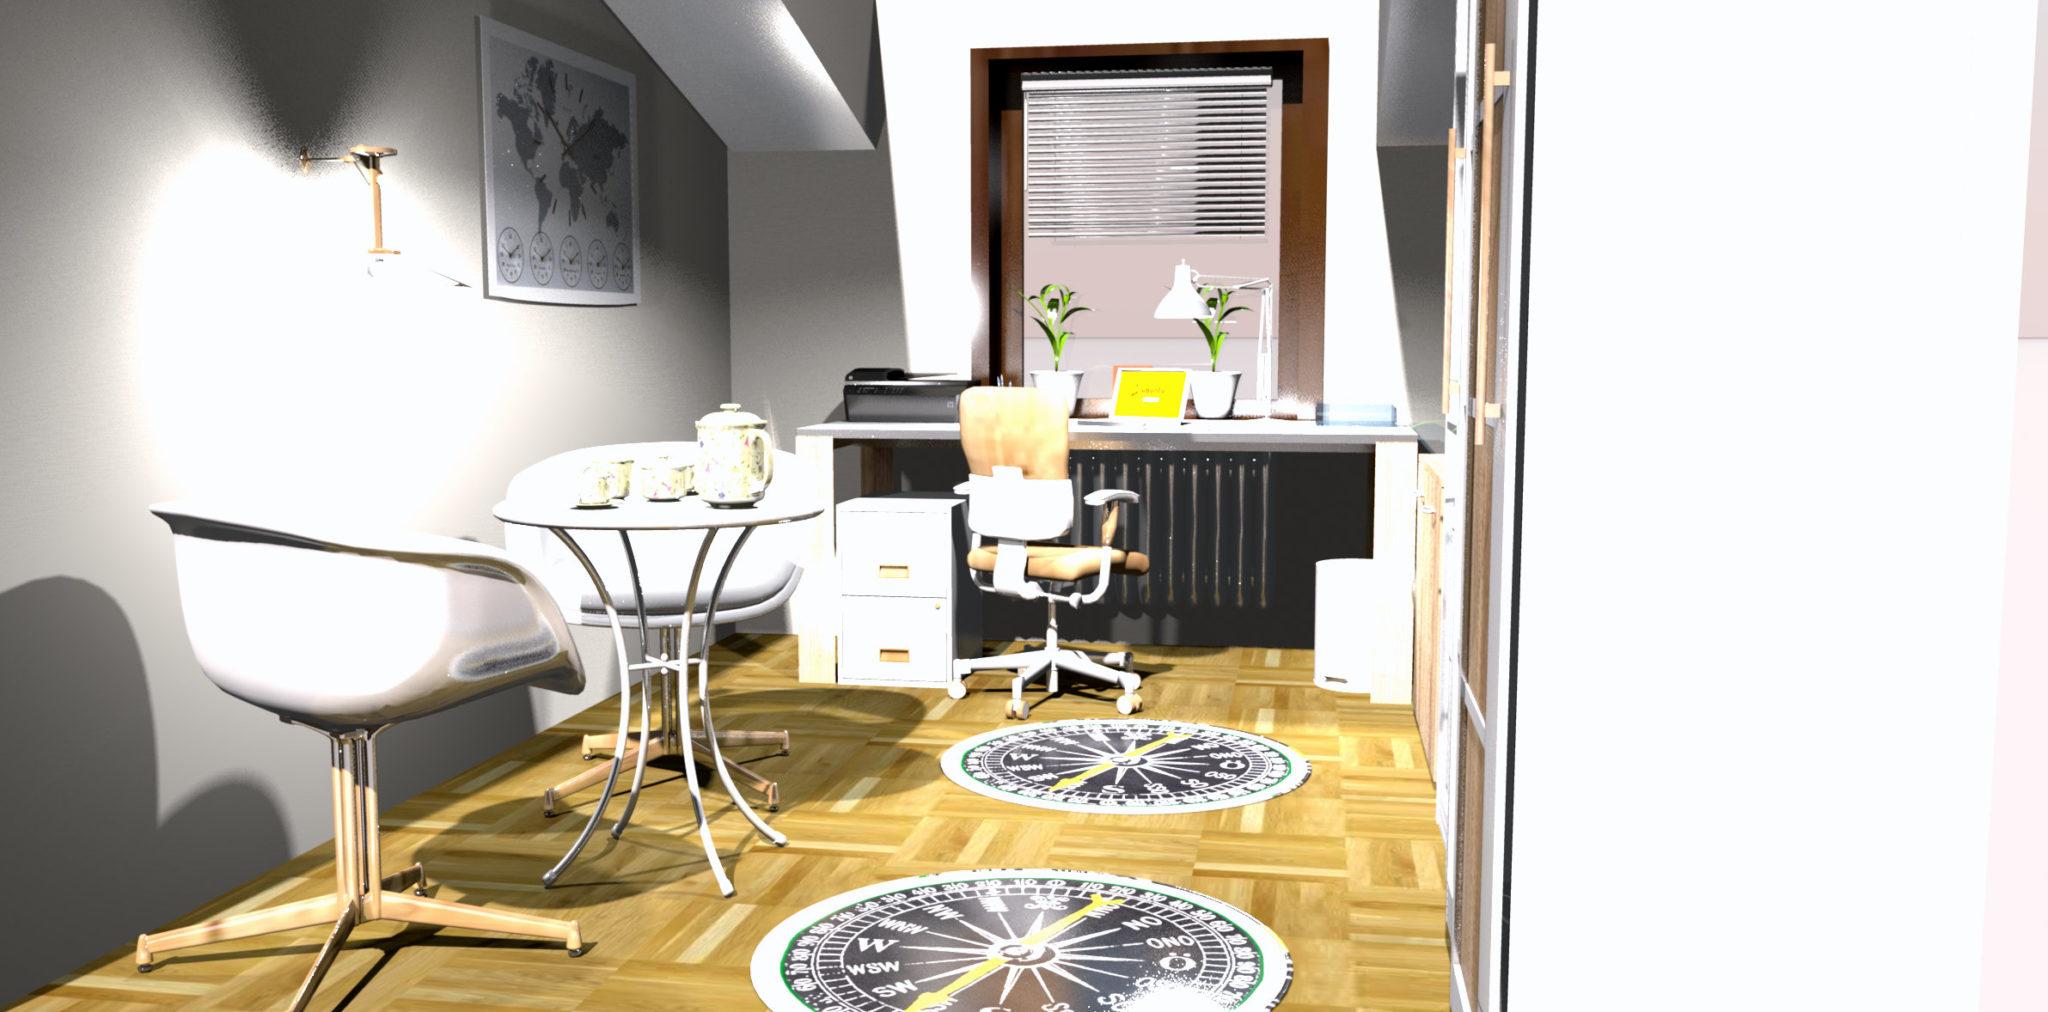 aranzacja biura2 - Aranżacja biura